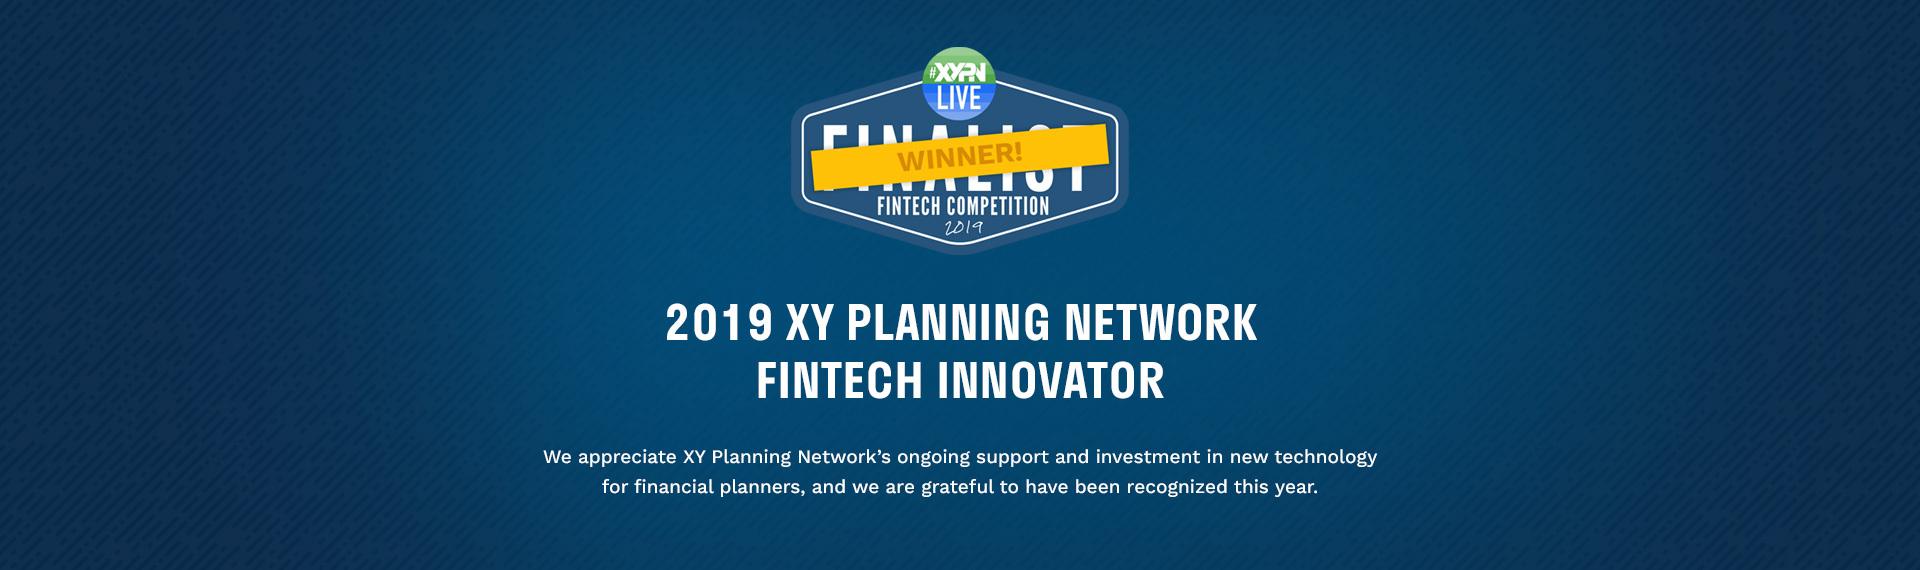 XYPN Fintech Innovator Winner